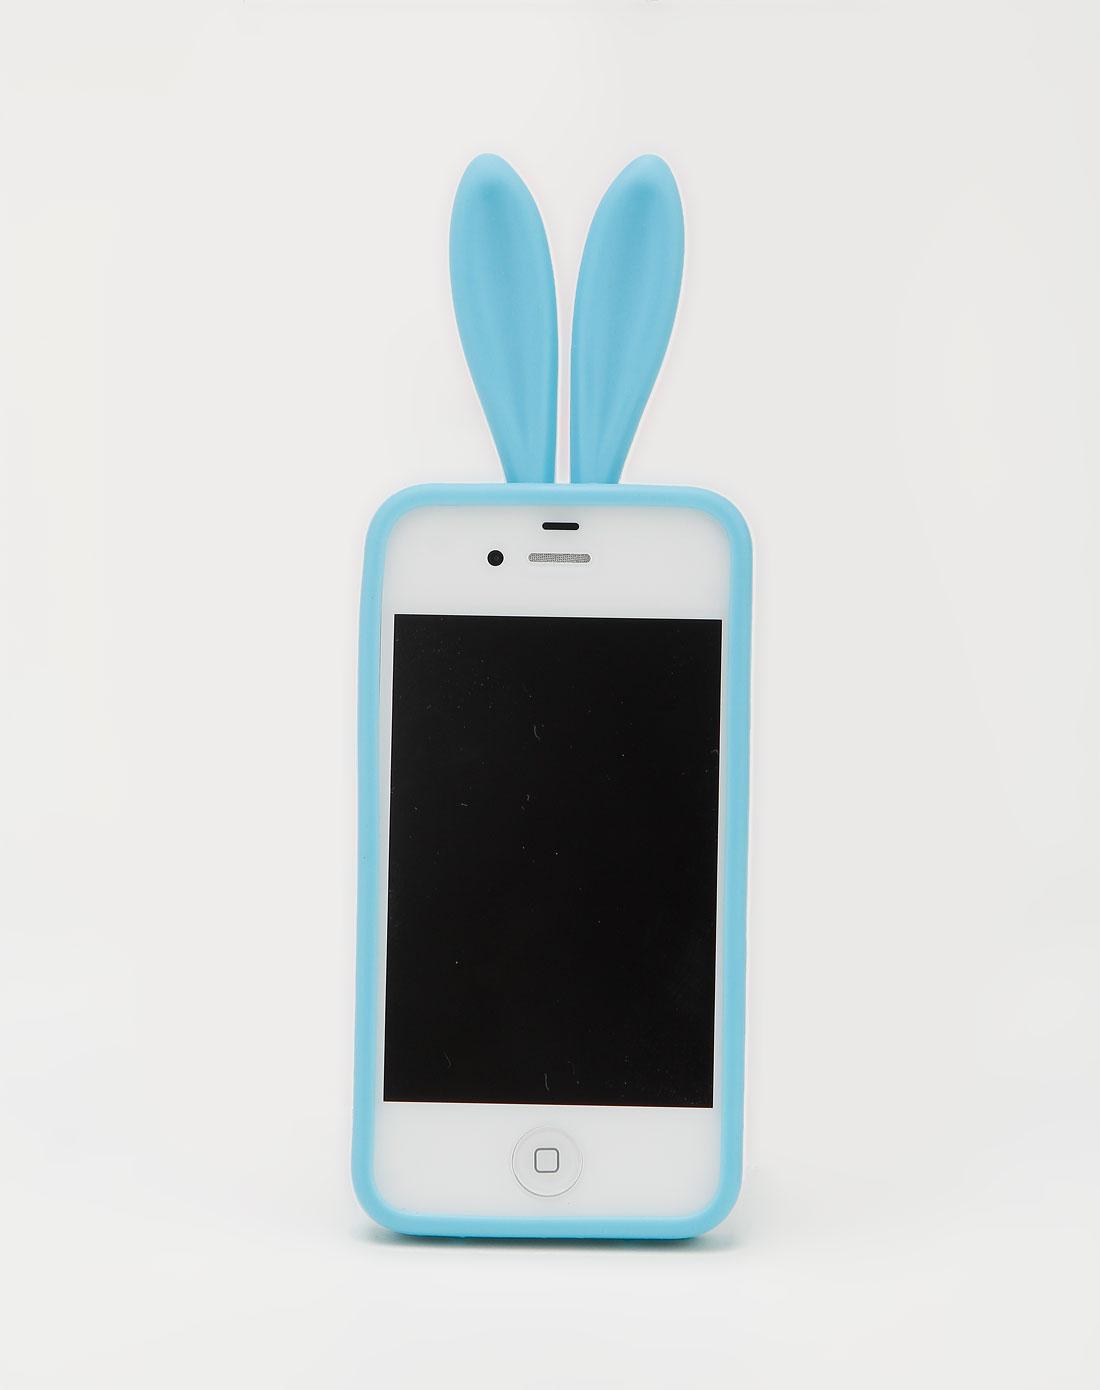 iphone4/4s 蓝色可爱兔子手机套